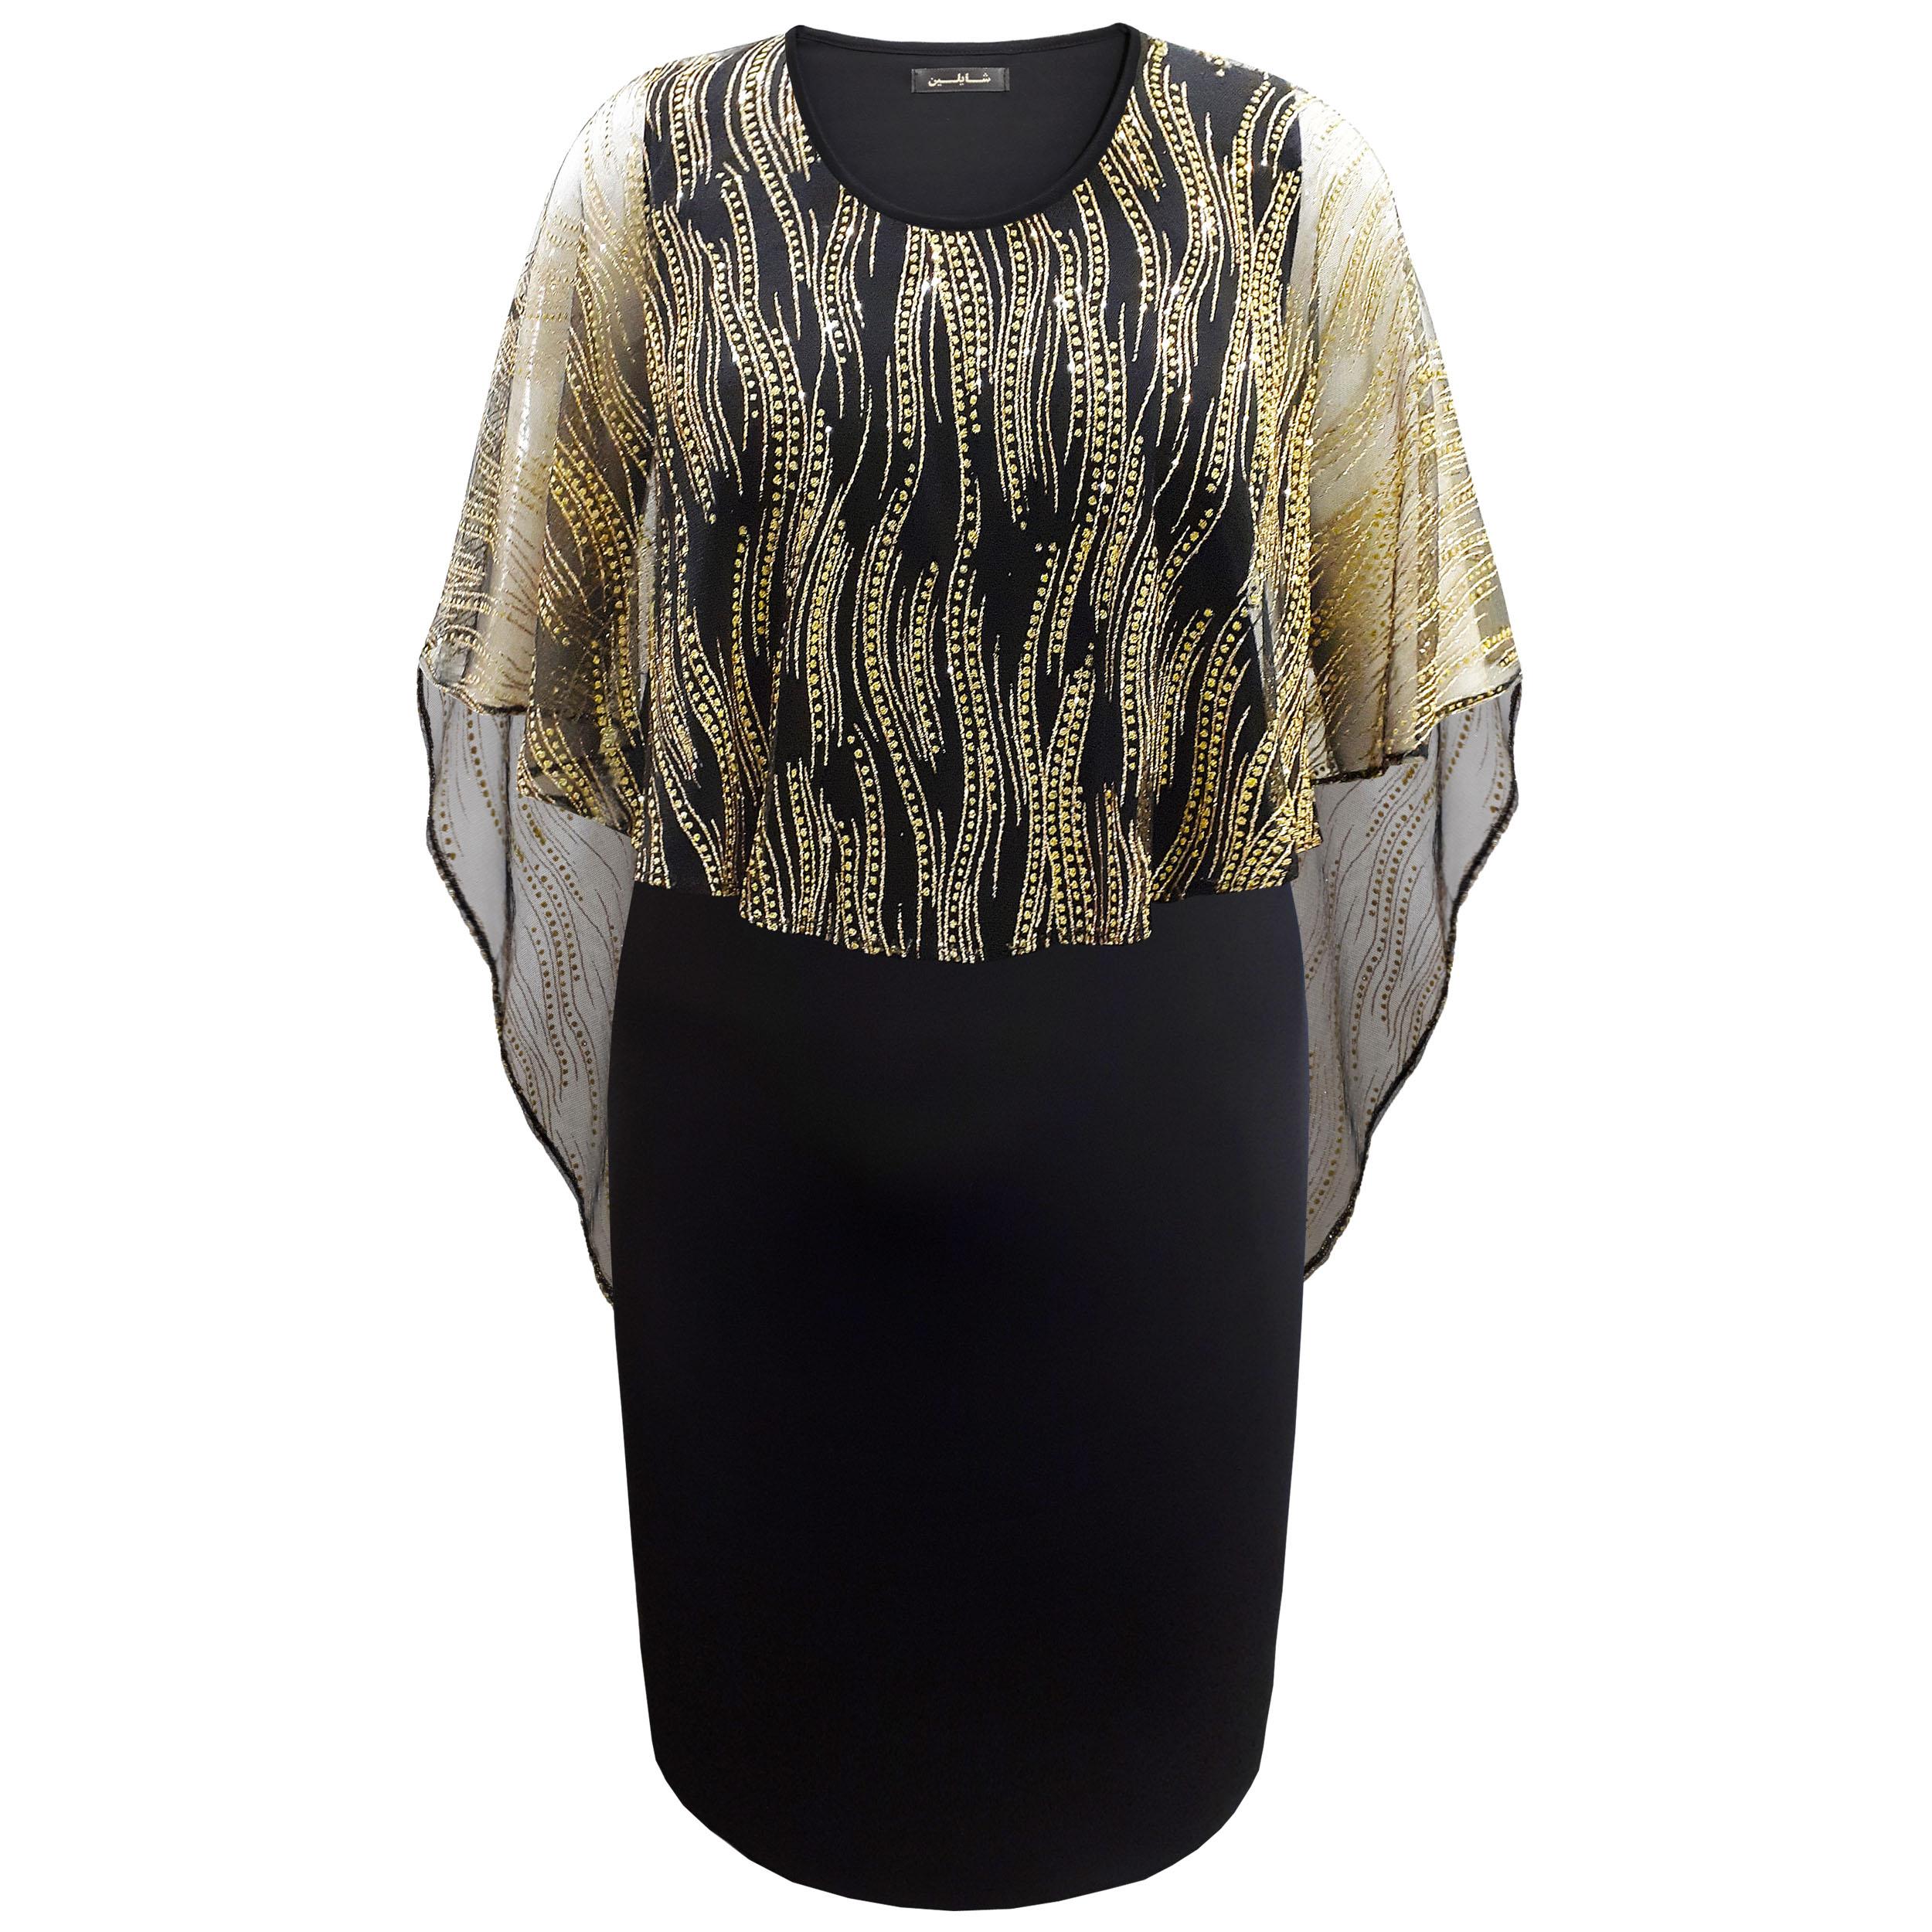 پیراهن زنانه شایلین کد 1131